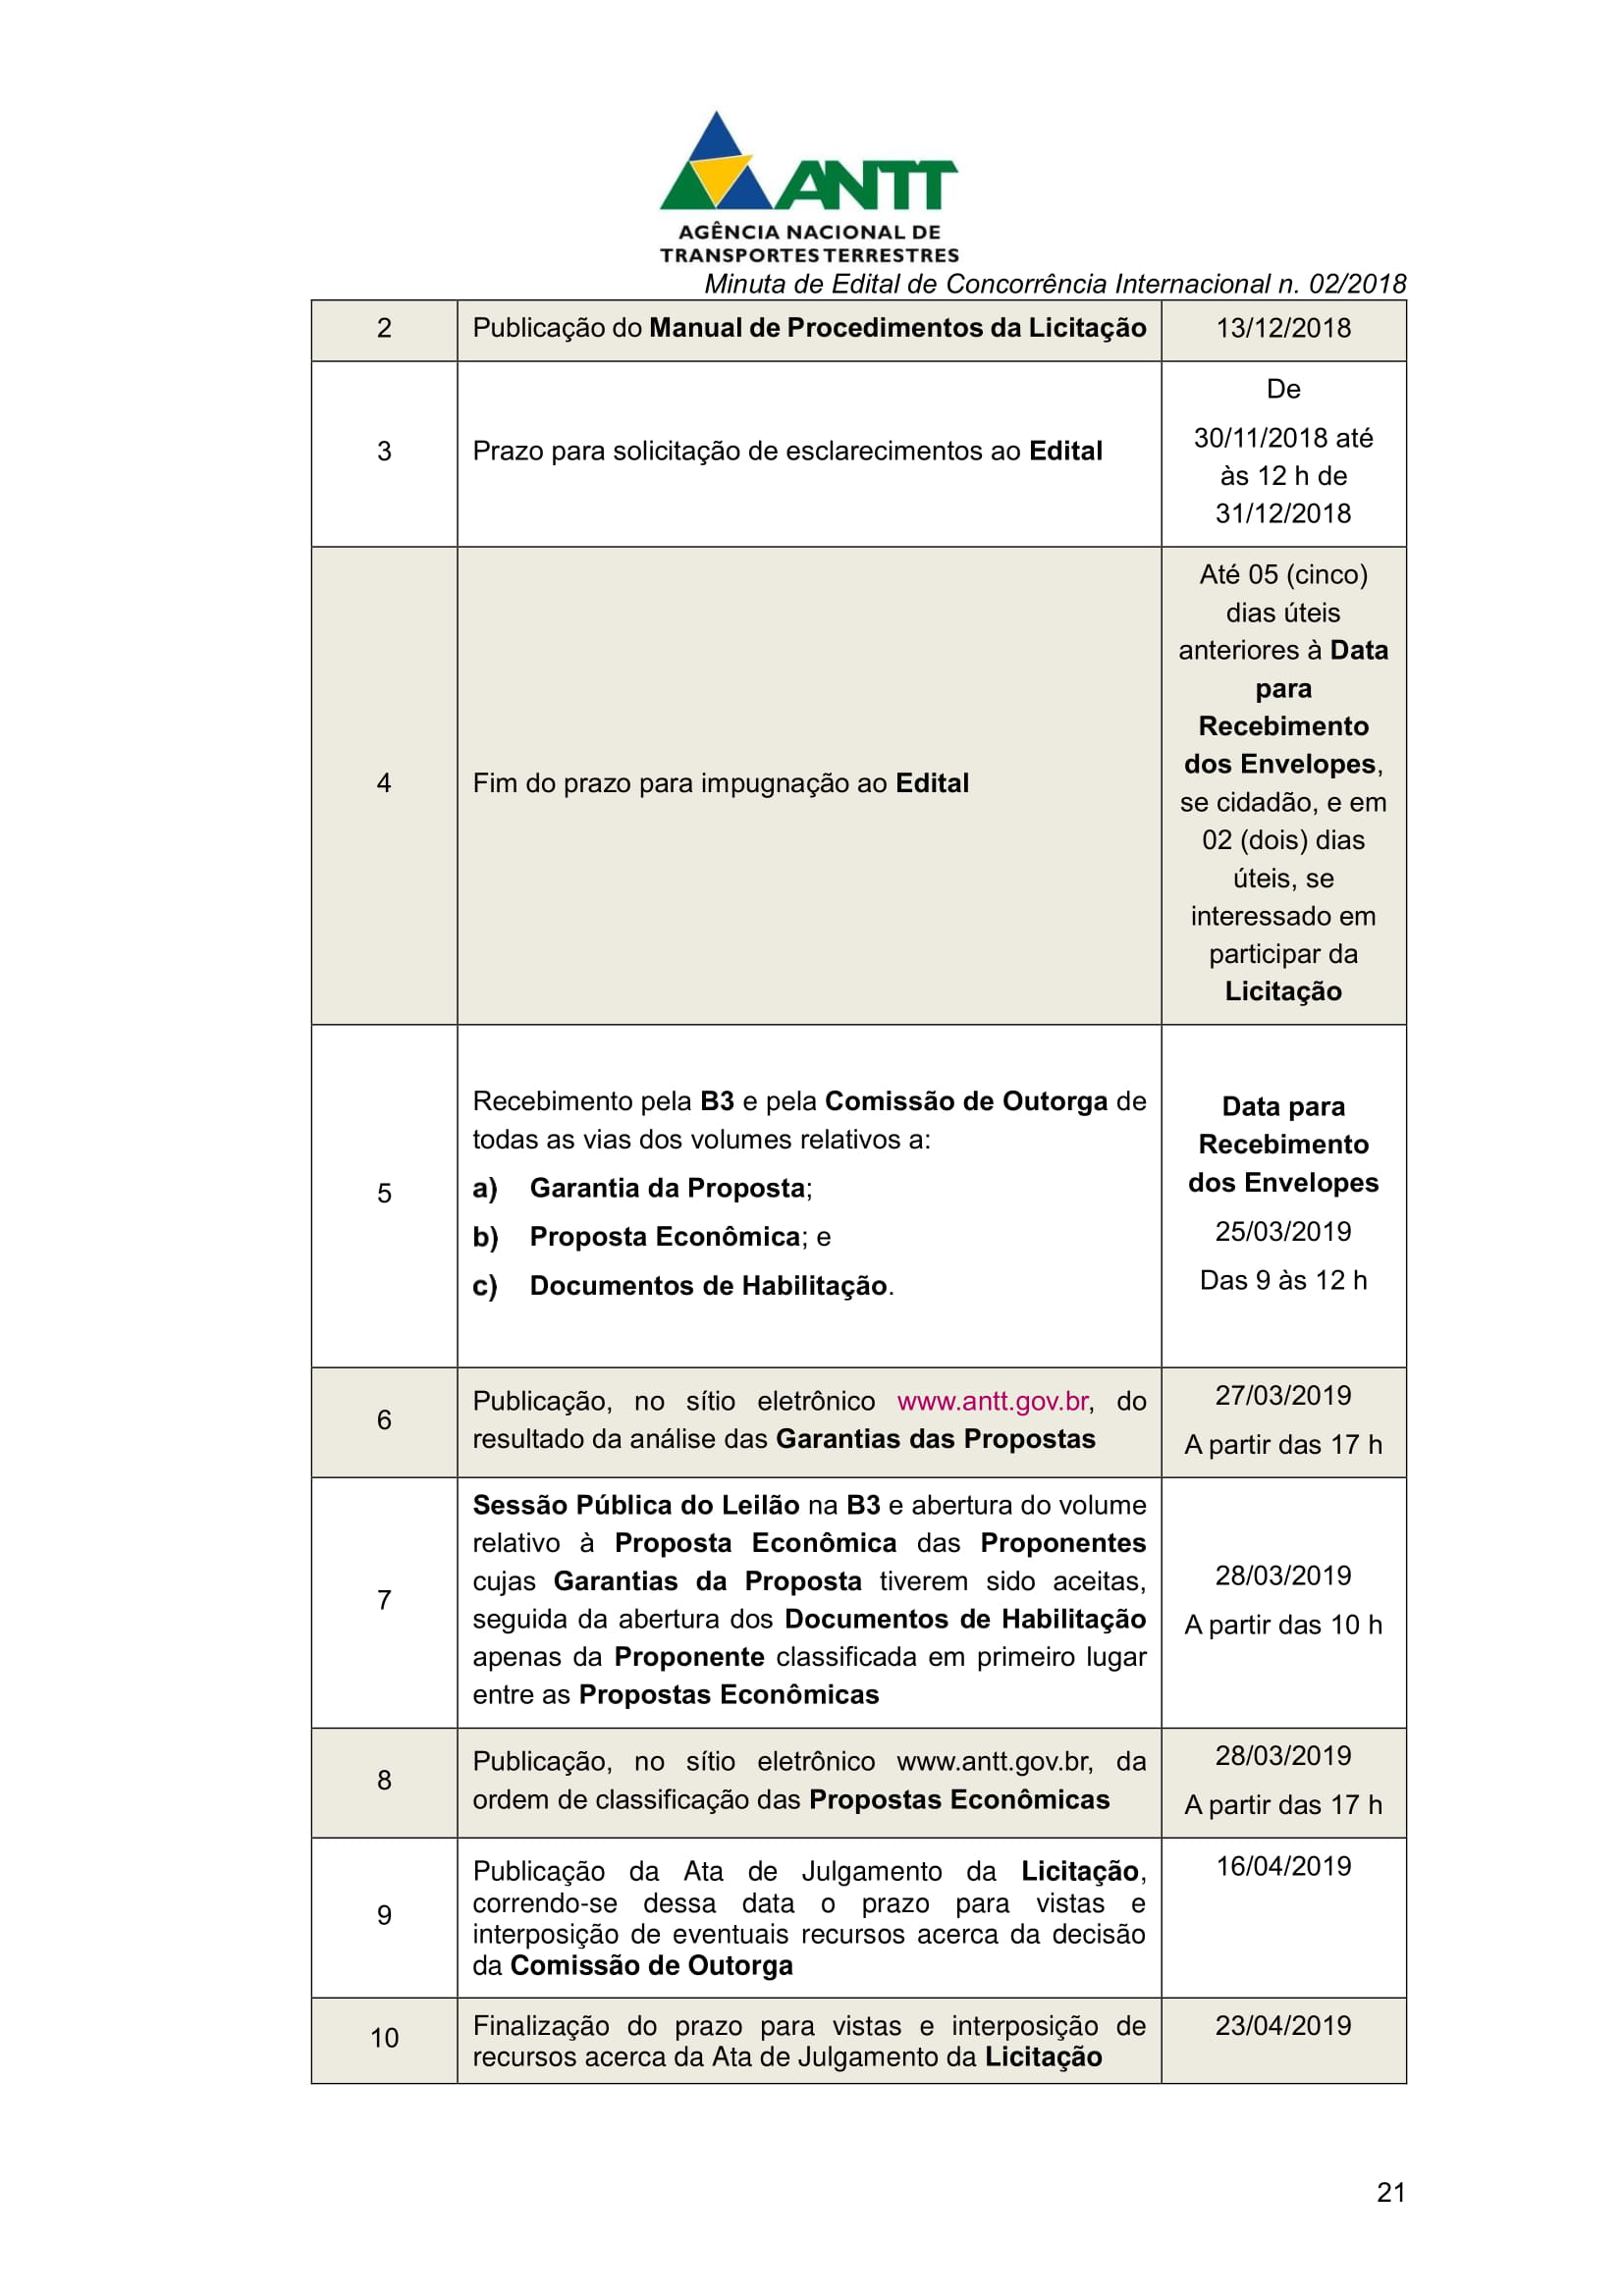 minuta_de_edital_-_porto_nacional-estrela_doeste-21